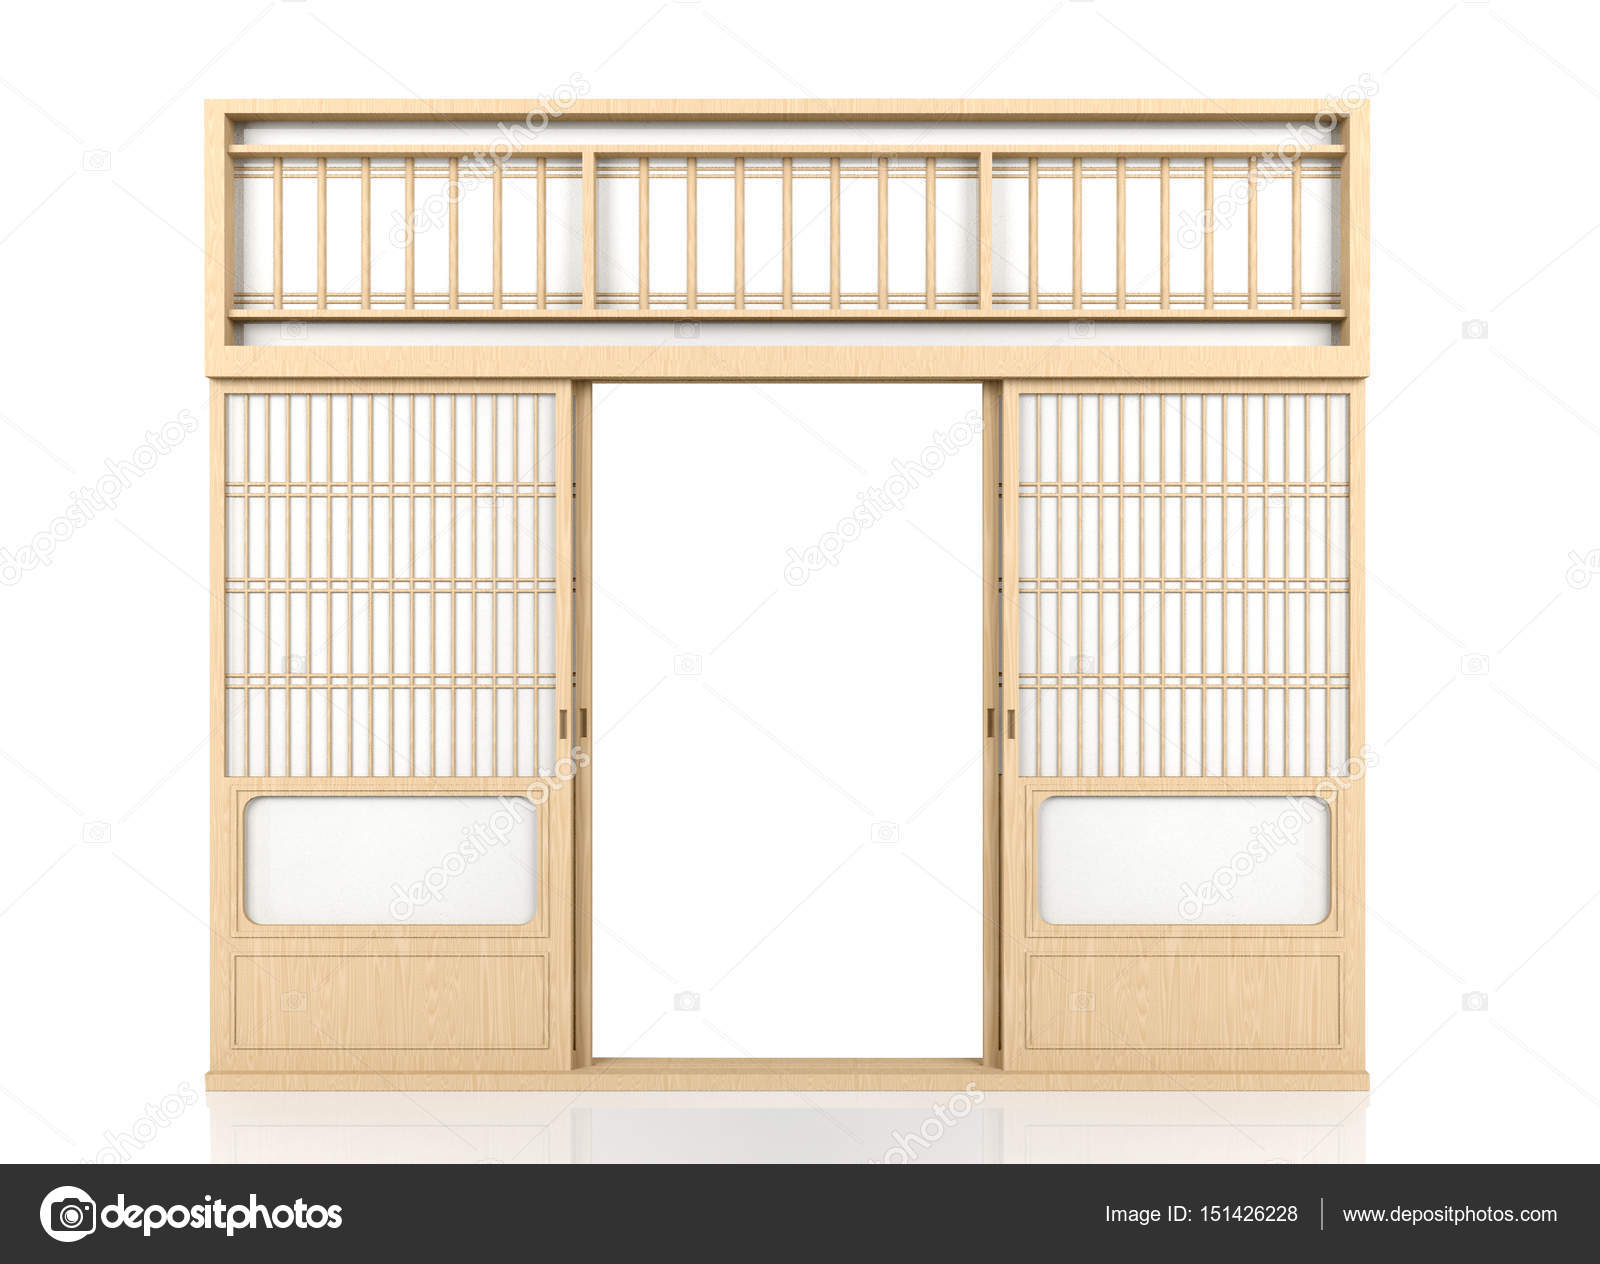 Wooden traditional Japanese Shoji door isolated on white background \u2014 Stock Photo  sc 1 st  Depositphotos & Wooden traditional Japanese Shoji door isolated on white background ...